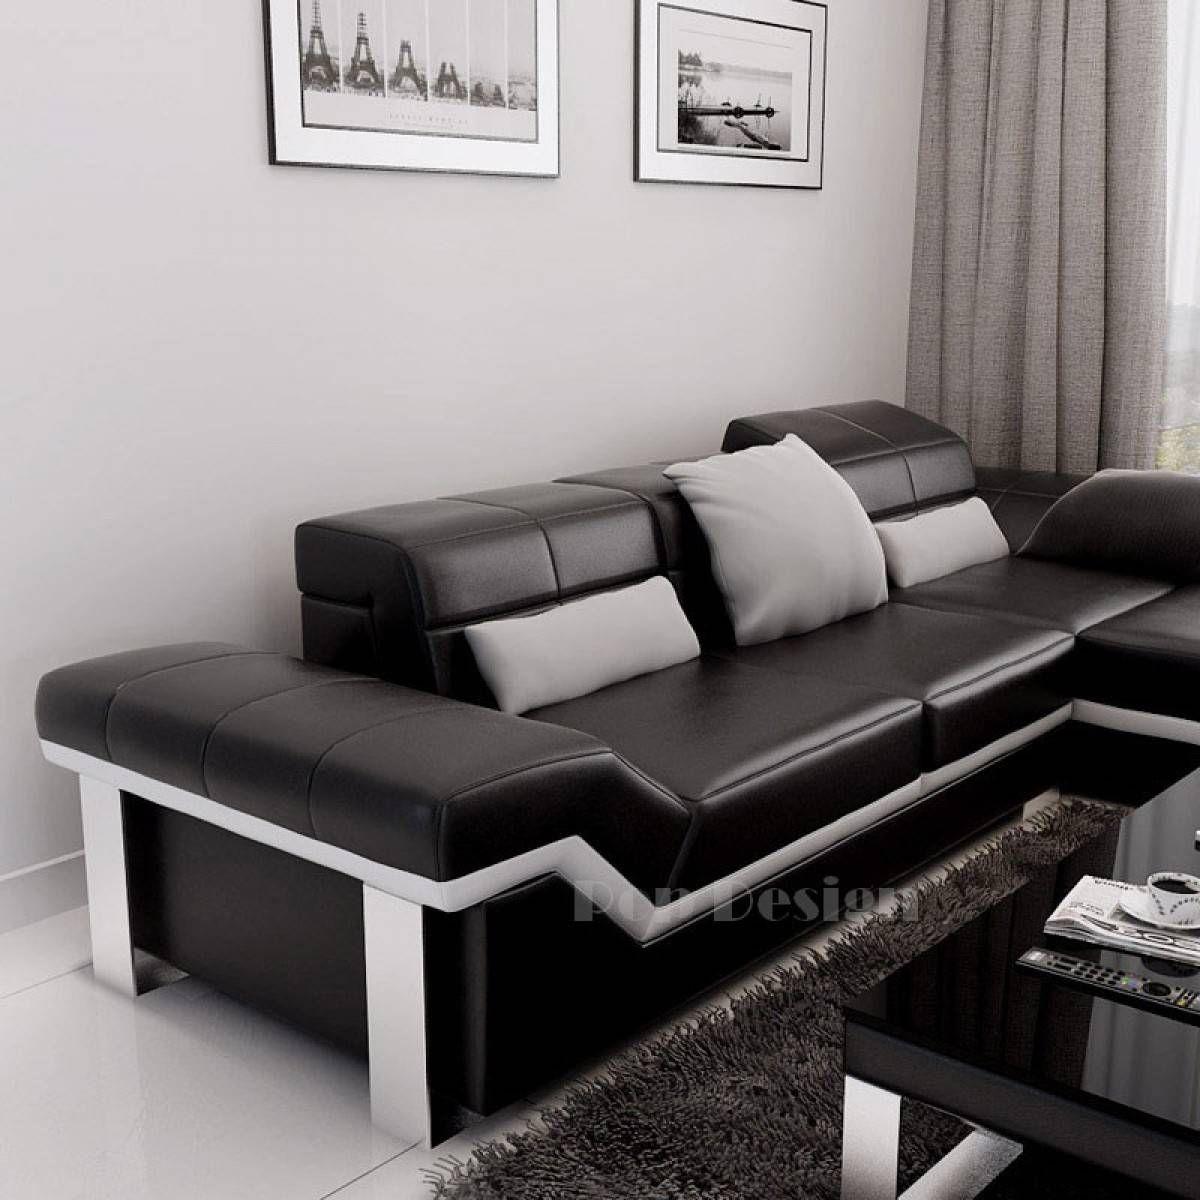 Canape Cuir D Angle Design Canape D Angle Design En Cuir Torino Pouf In 2020 Design Home Decor